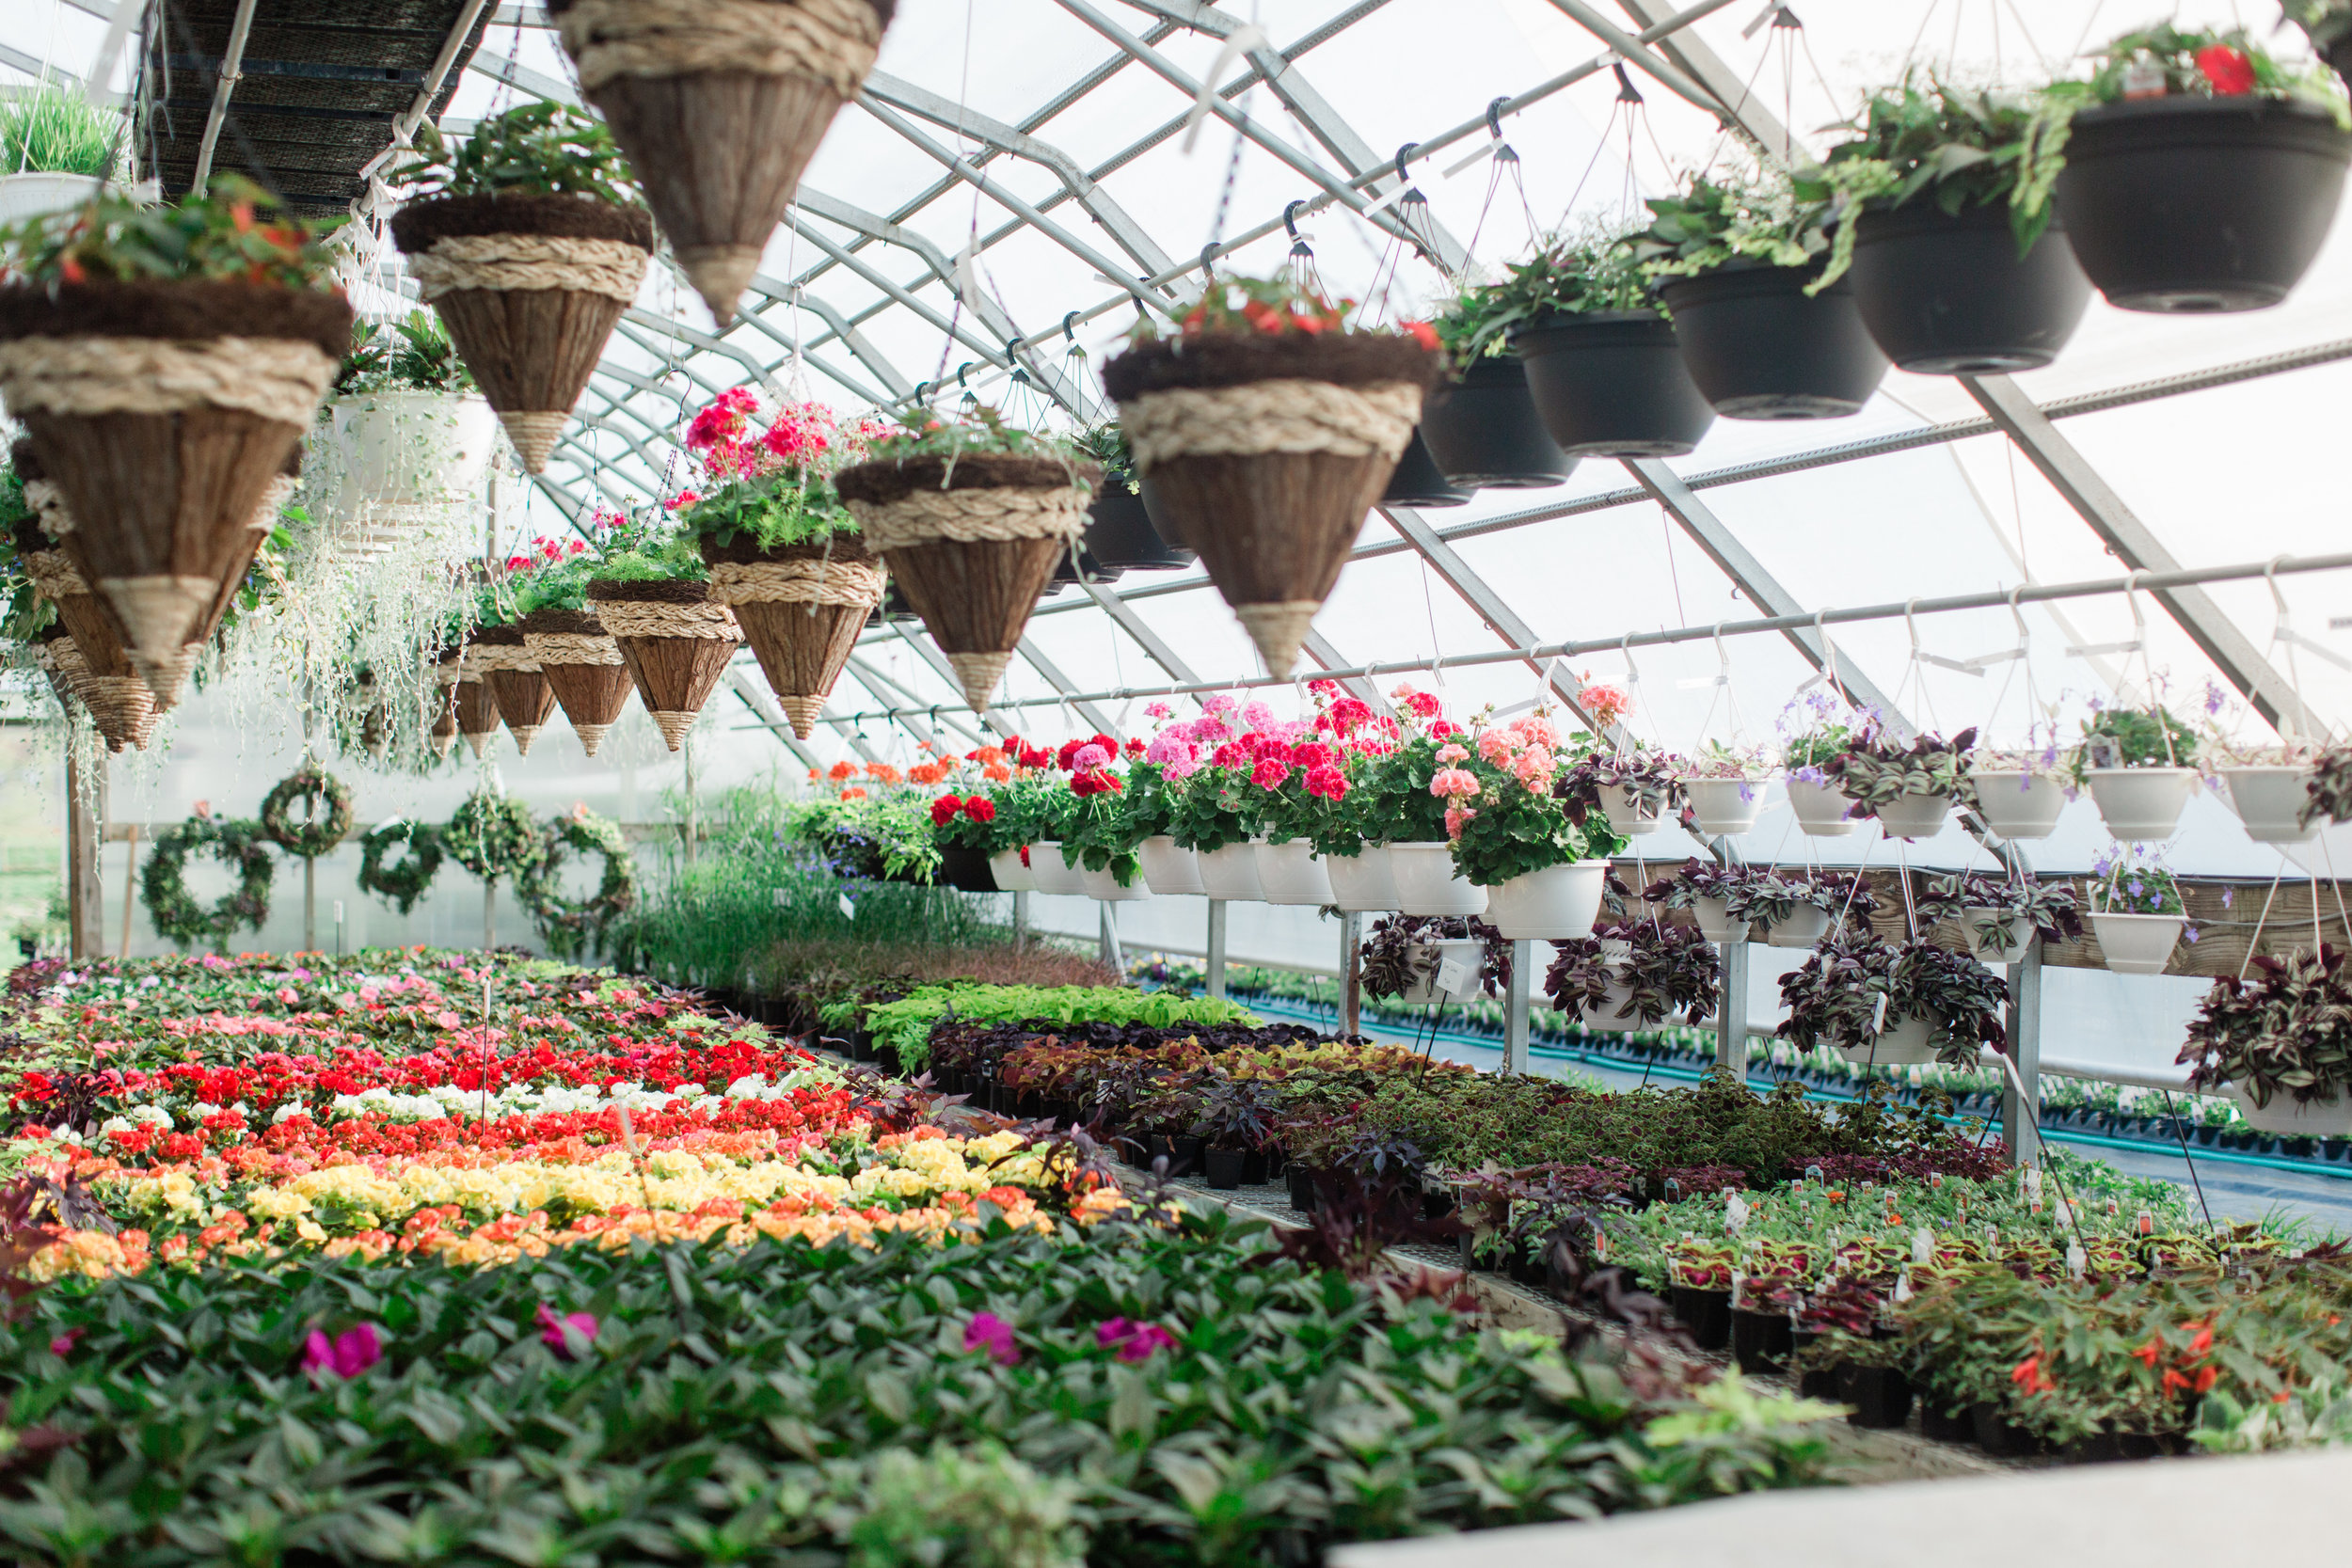 Greenhouse-7.jpg